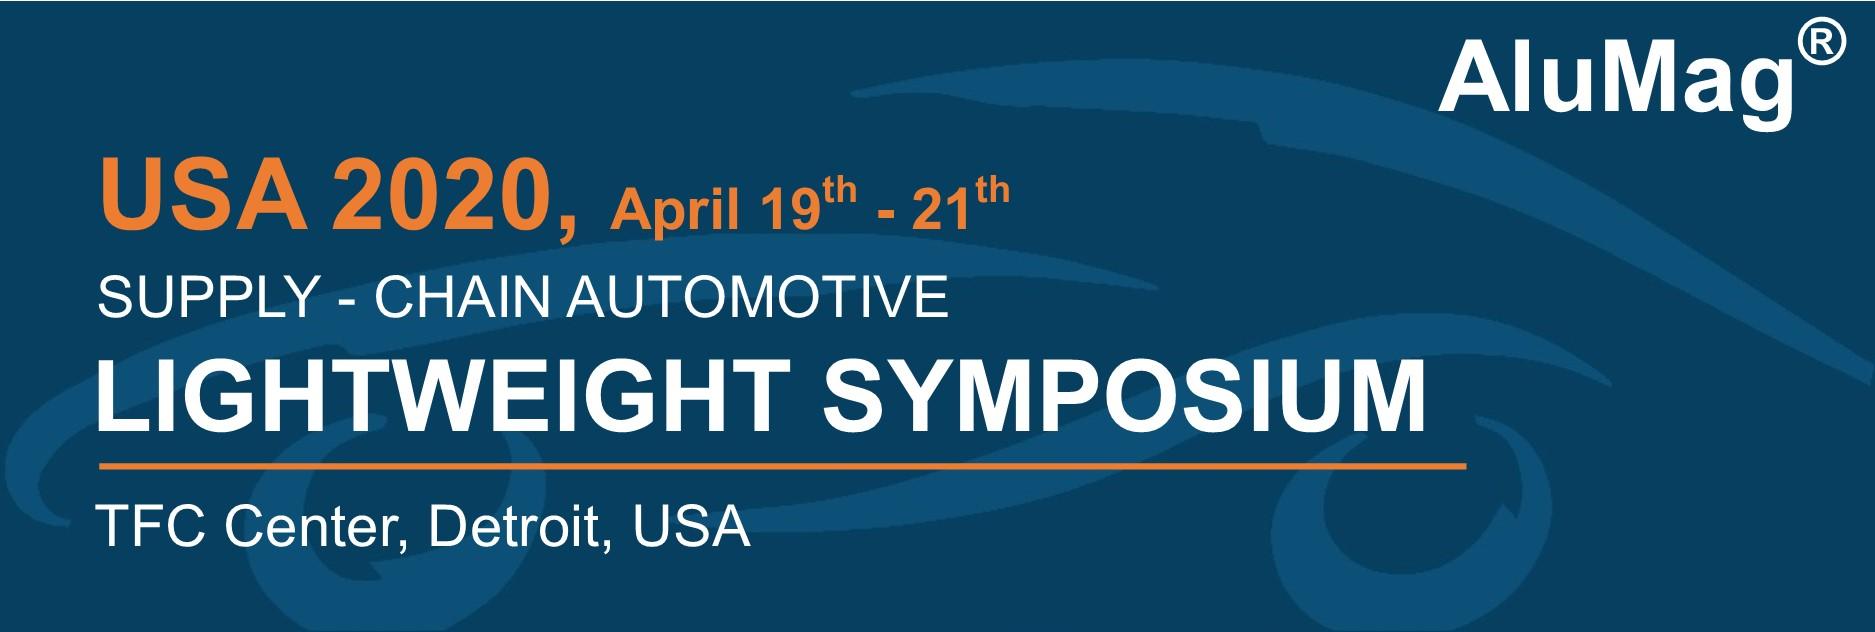 AluMag_Symposium_Logo_USA 2020